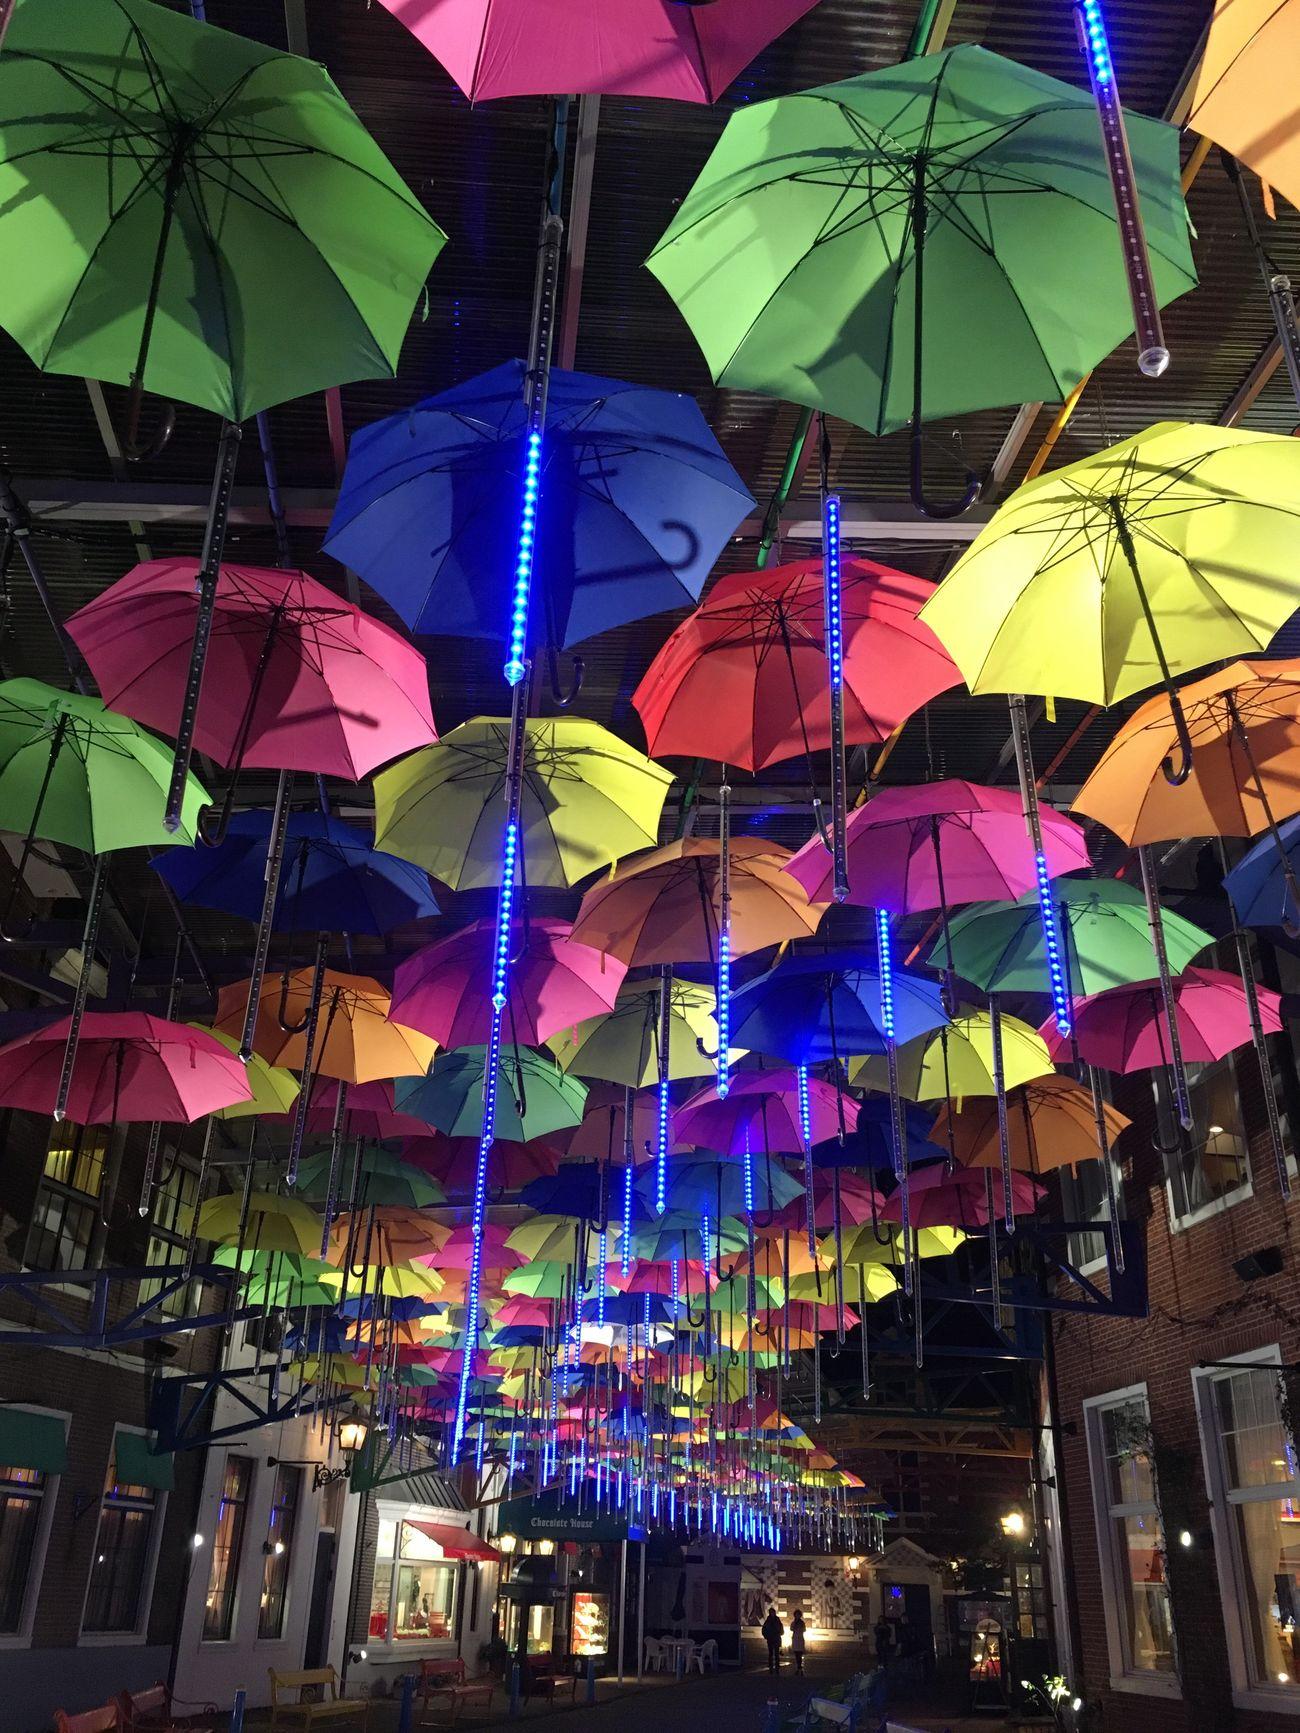 Umbrellastreet Umbrella Street Colorful Colors Colour Of Life Night Vitamin Color Colorfull Multi Colored Beautiful Illuminations Illuminated Built Structure Huis Ten Bosch Nagasaki Kyusyu Japan Japan Photography